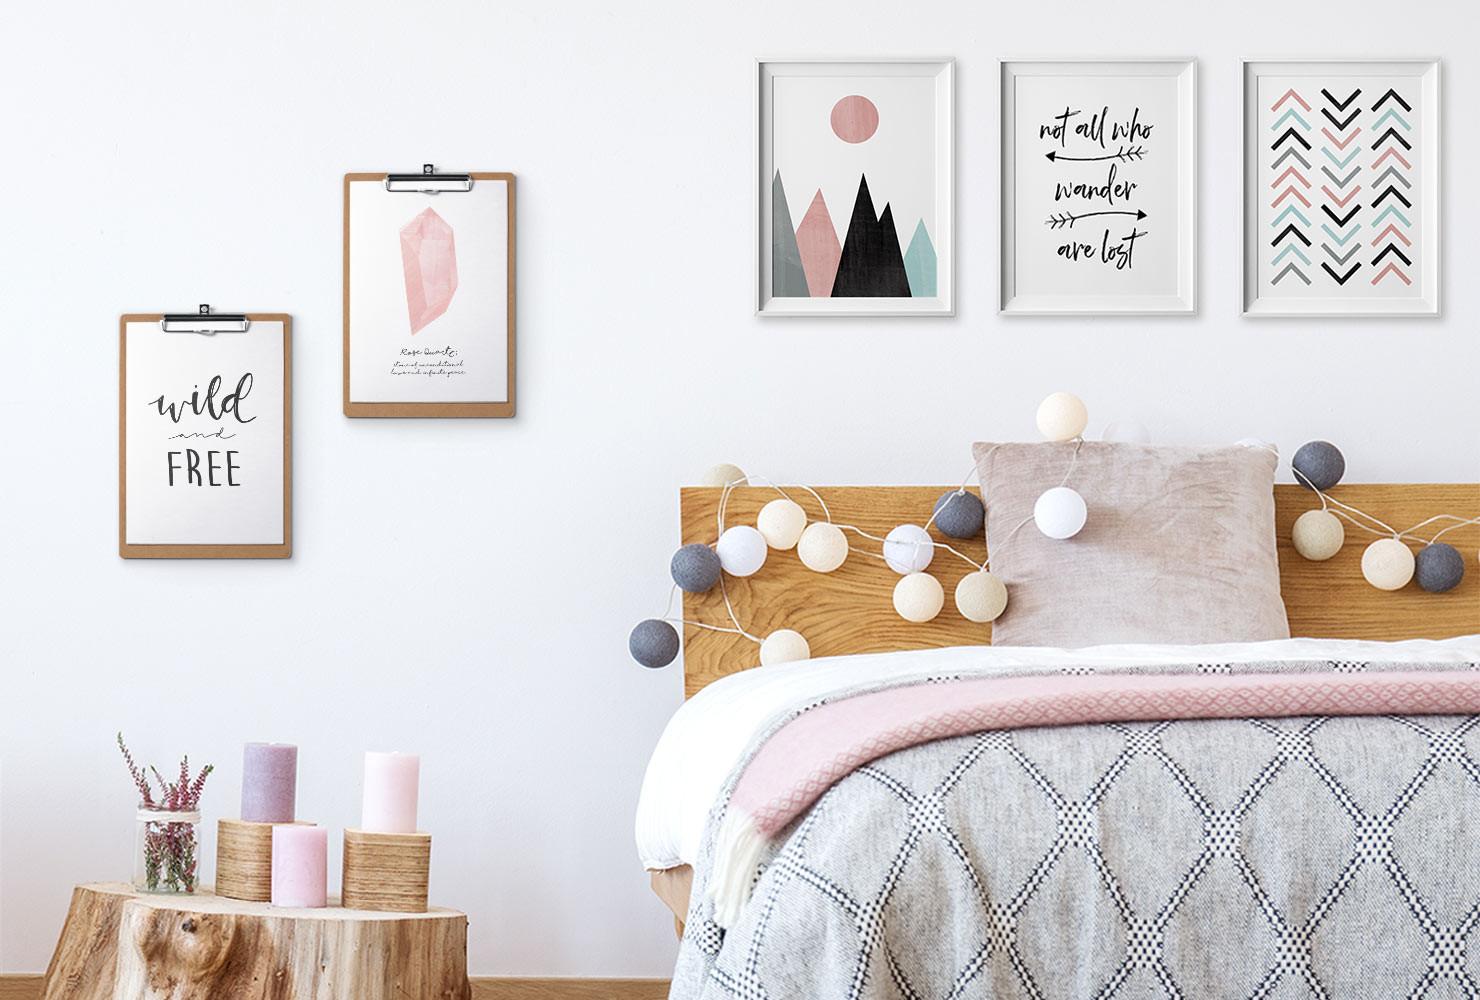 Room Diy  24 DIY Bedroom Decor Ideas To Inspire You With Printables